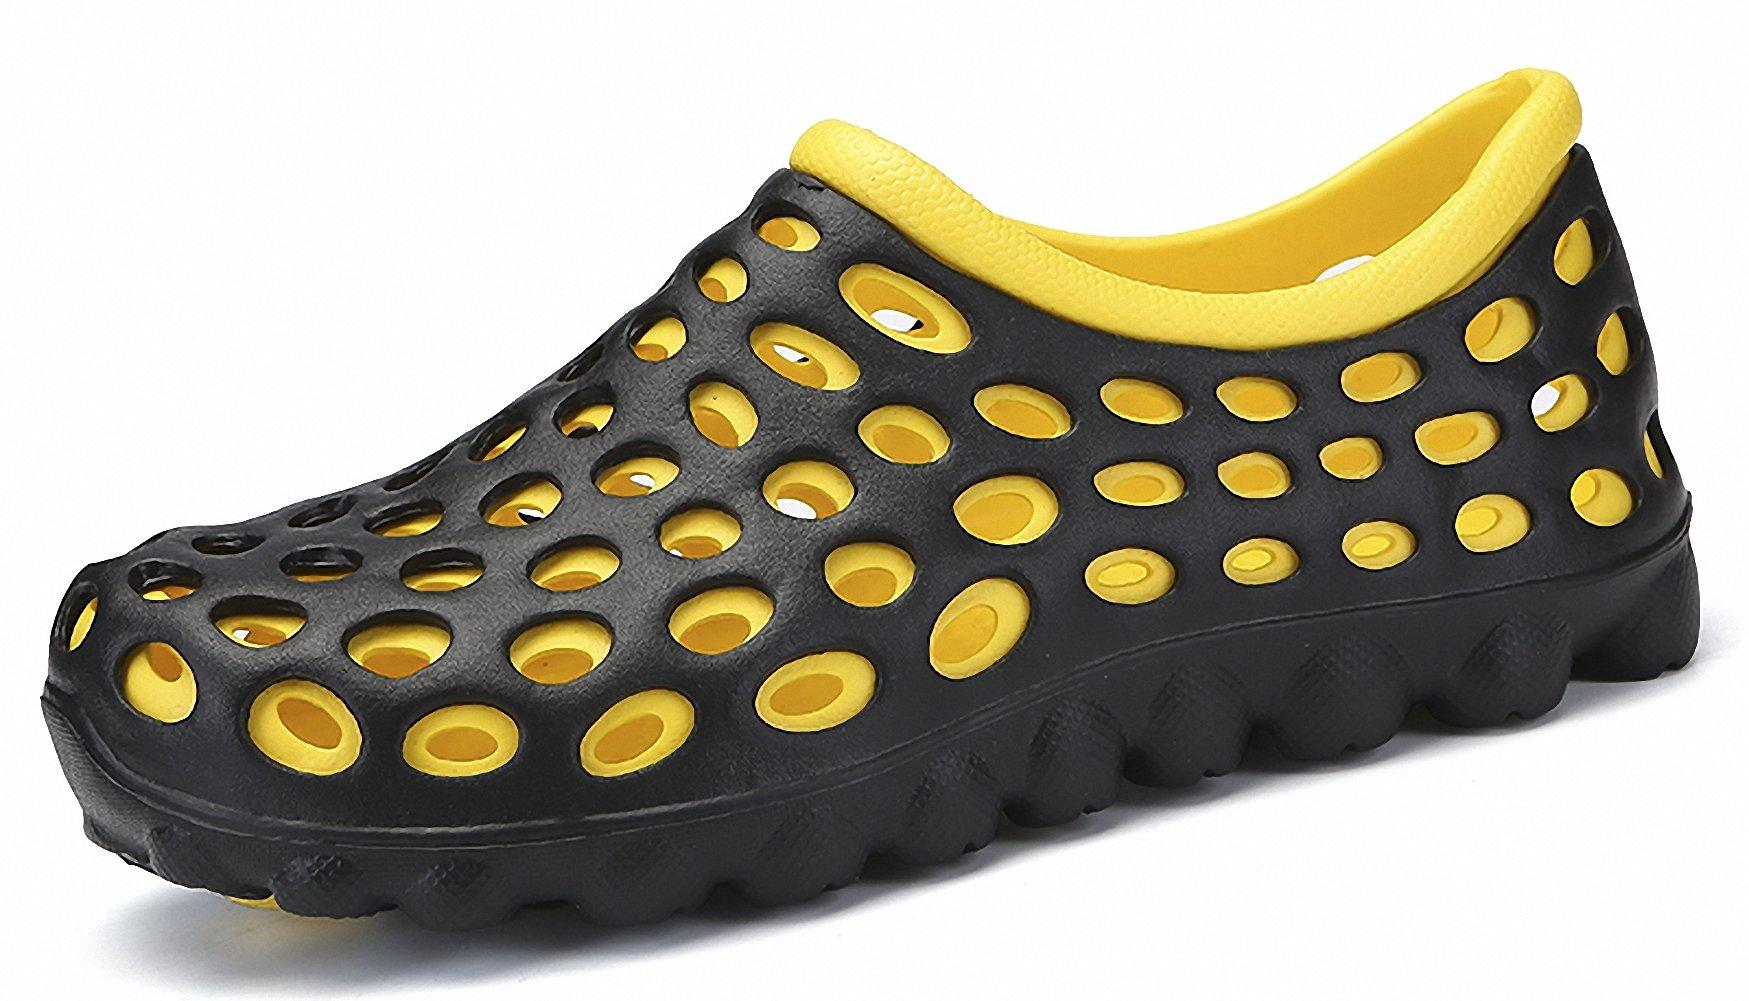 ZHENZHONG Men's Lightweight Aqua Slip on Water Shoes Yellow Summer Beach Garden Clogs Shoes Sneakers